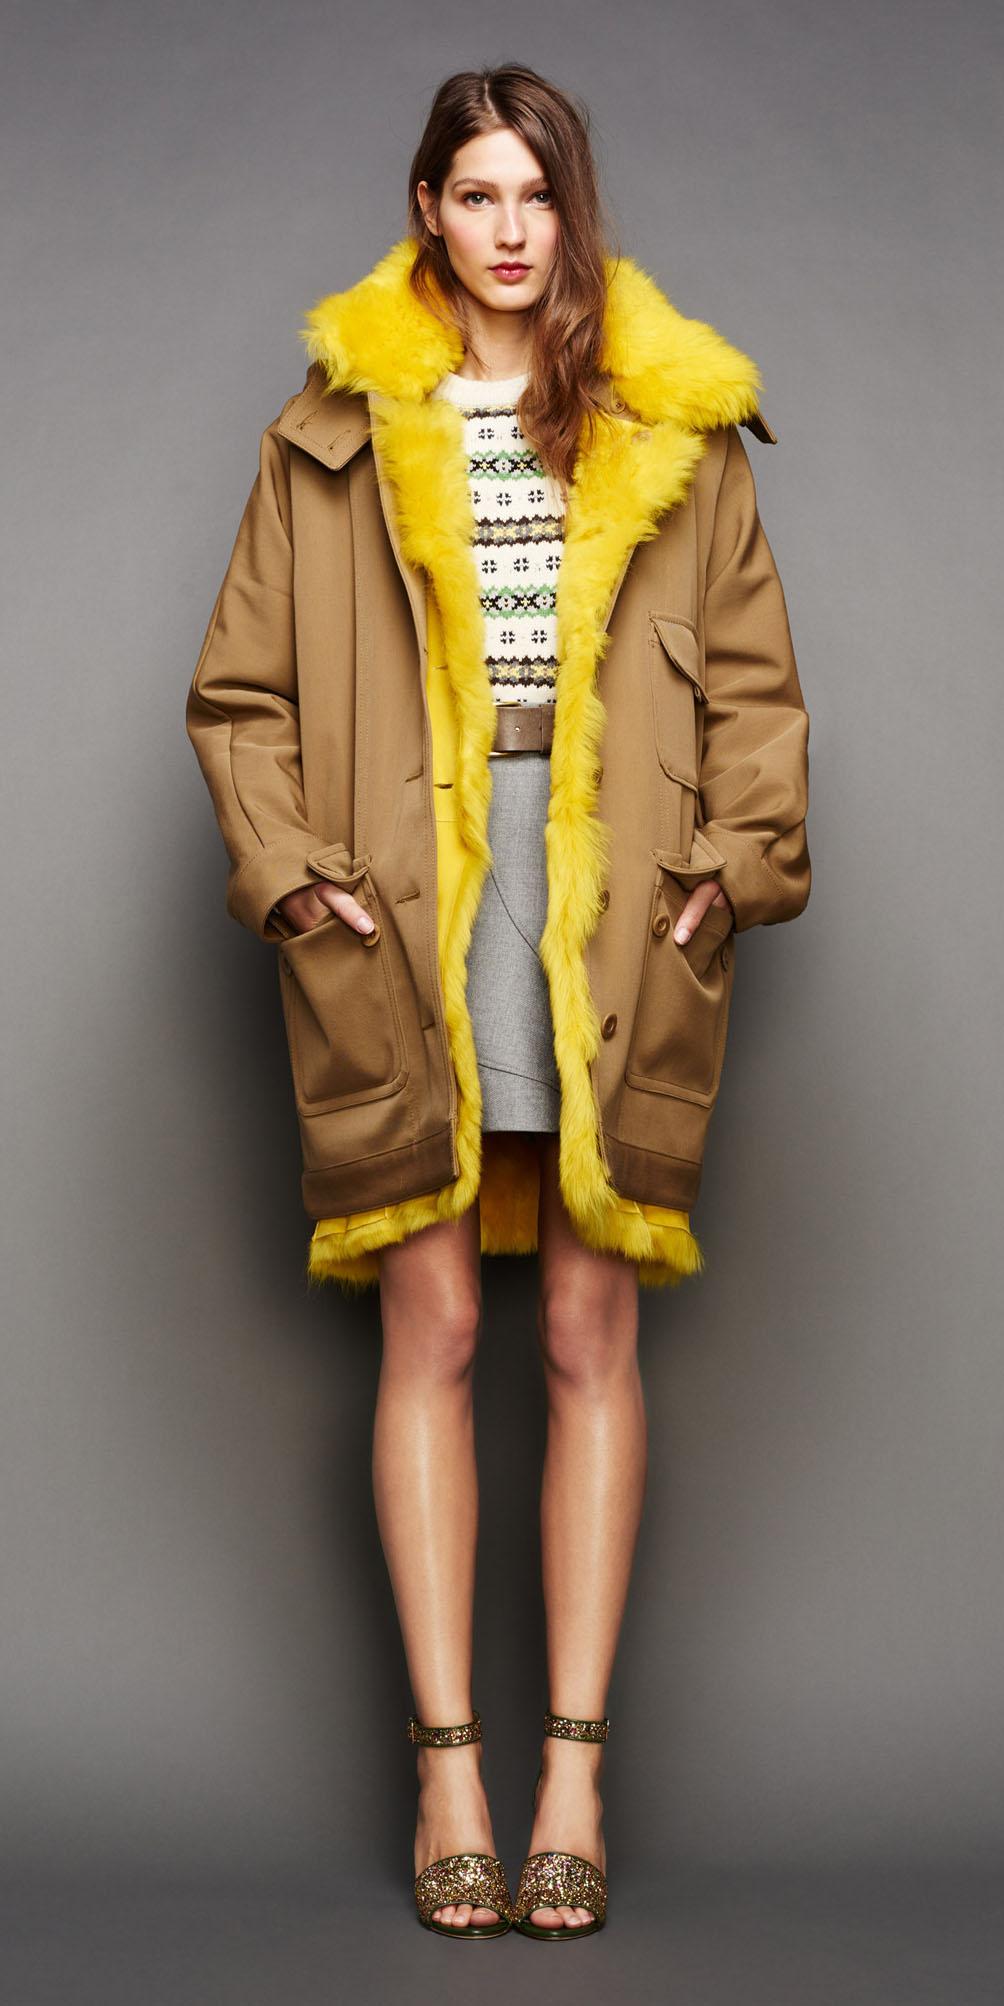 grayl-mini-skirt-white-sweater-print-fairisle-belt-jcrew-hairr-tan-shoe-sandalh-camel-jacket-coat-parka-fall-winter-outfit-lunch.jpg